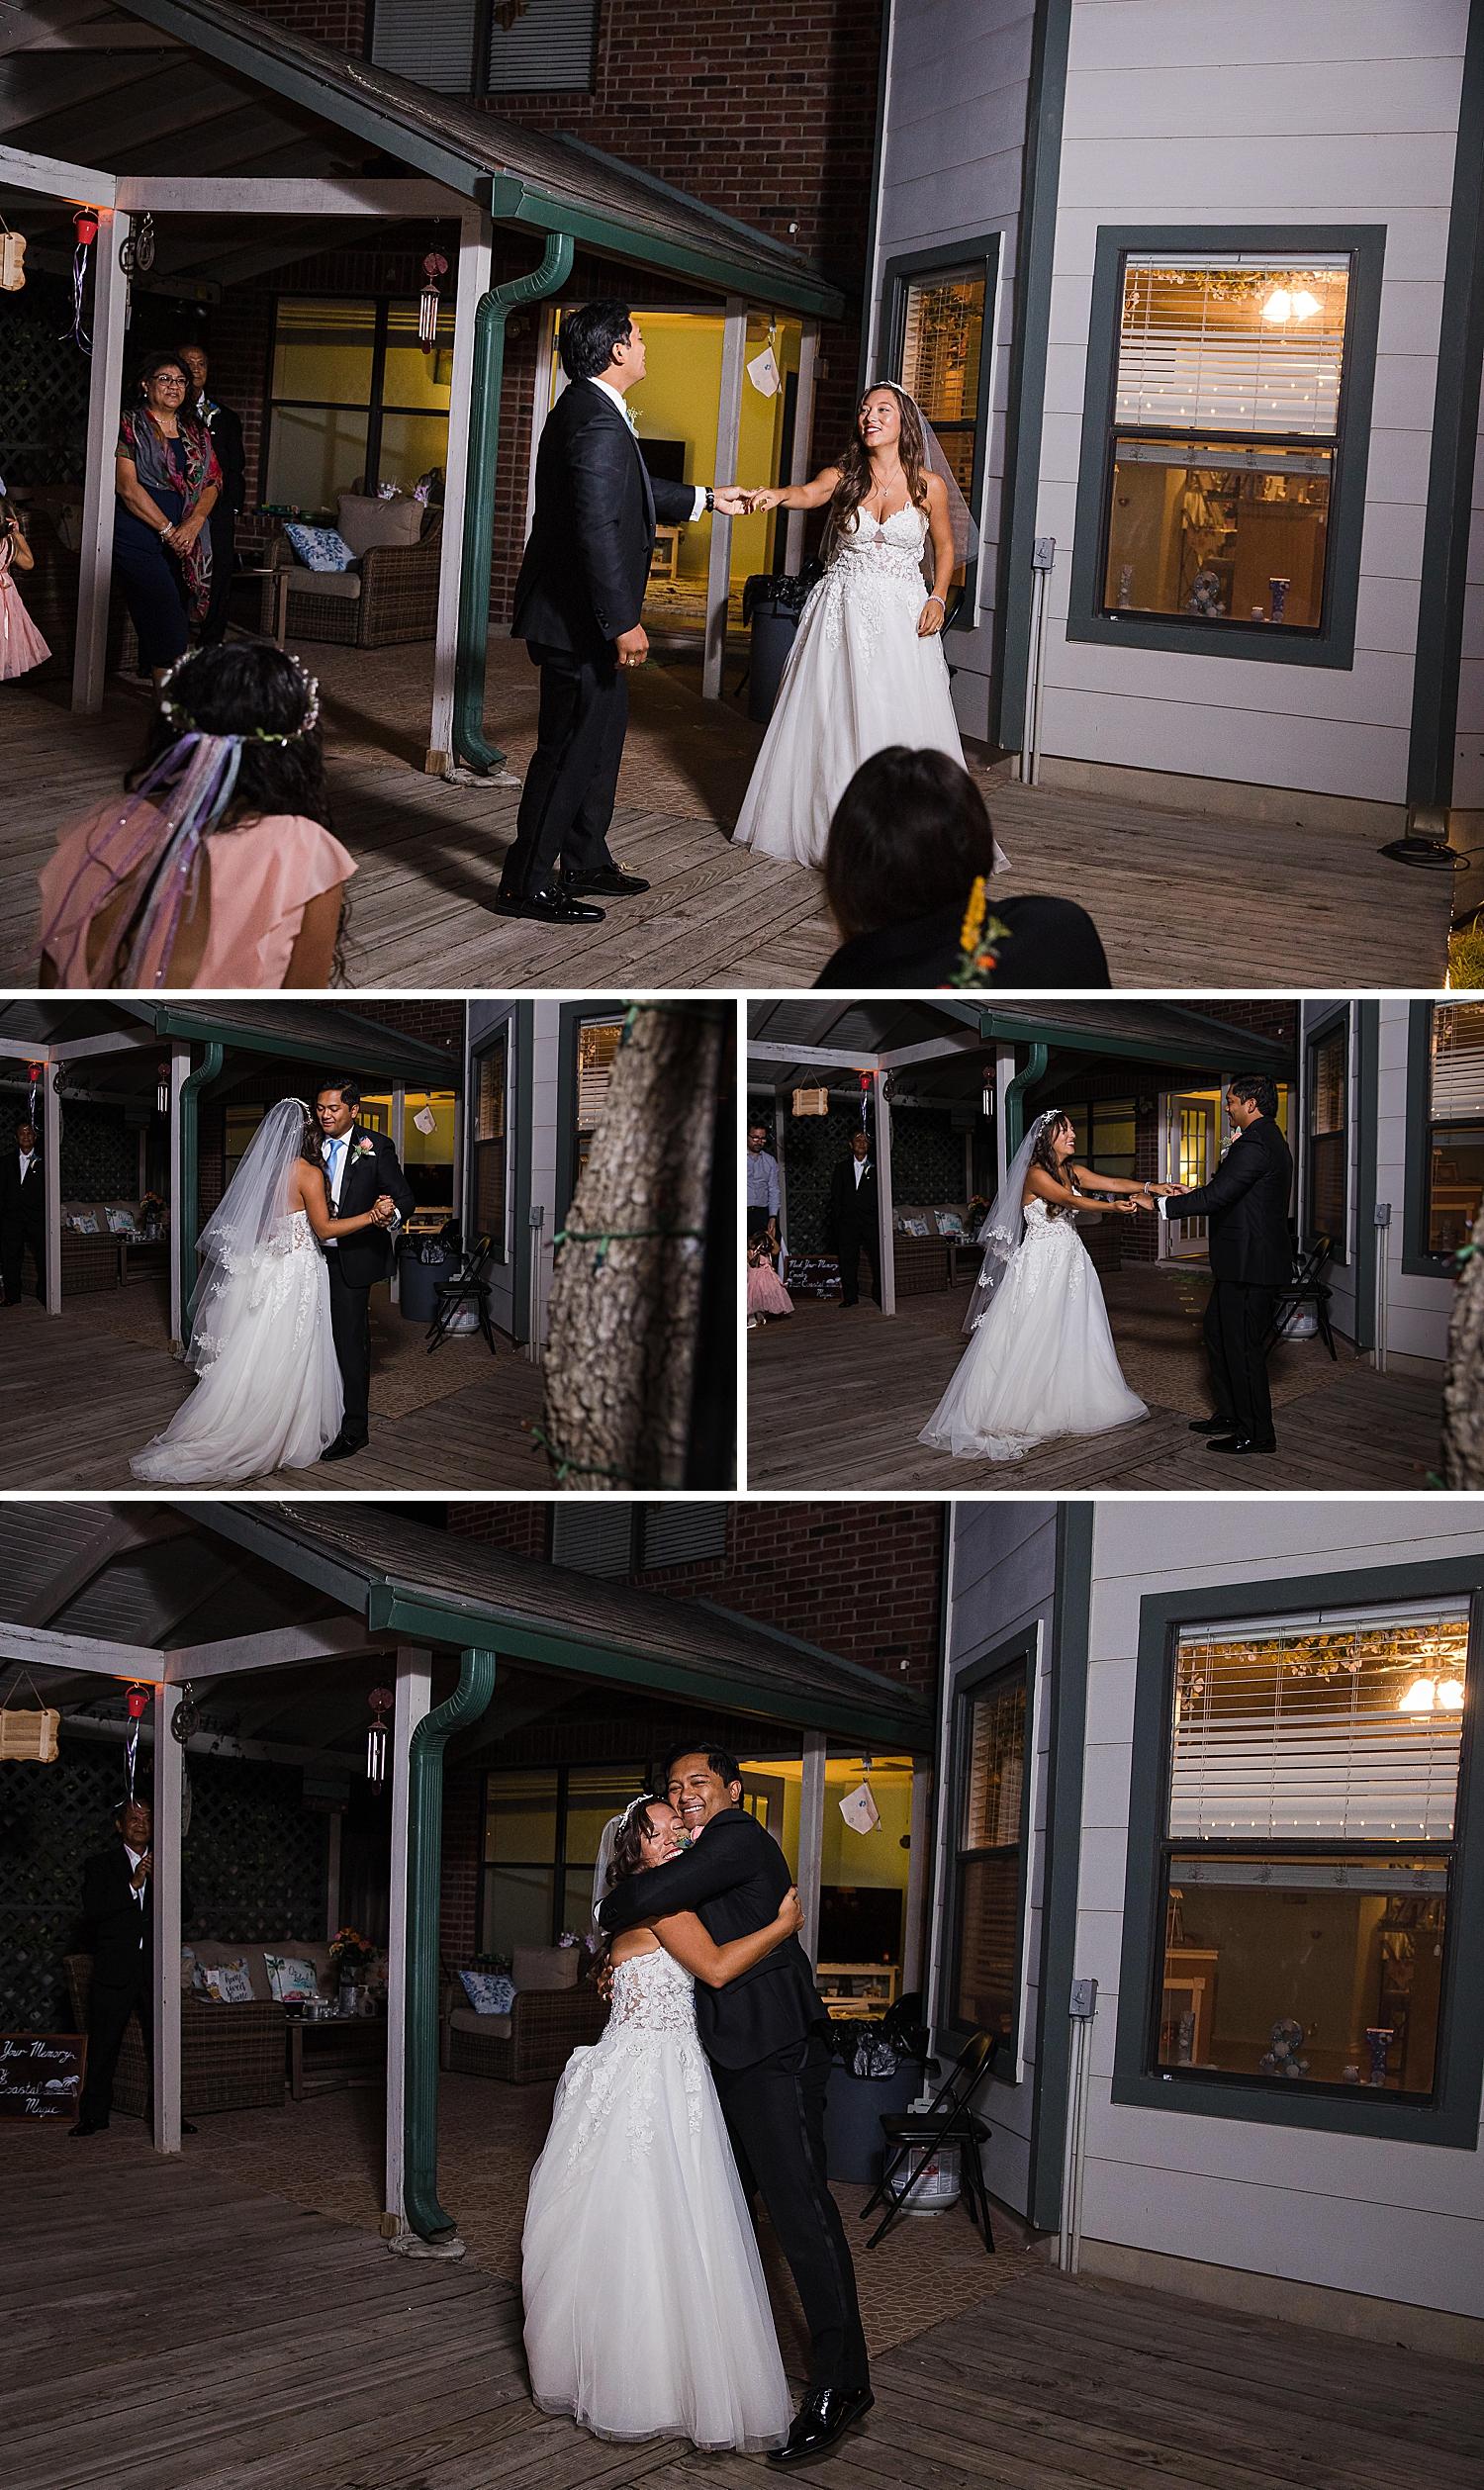 Bandera-Texas-Wedding-Photographer-Bride-Groom-on-Horses-Carly-Barton-Photography_0043.jpg